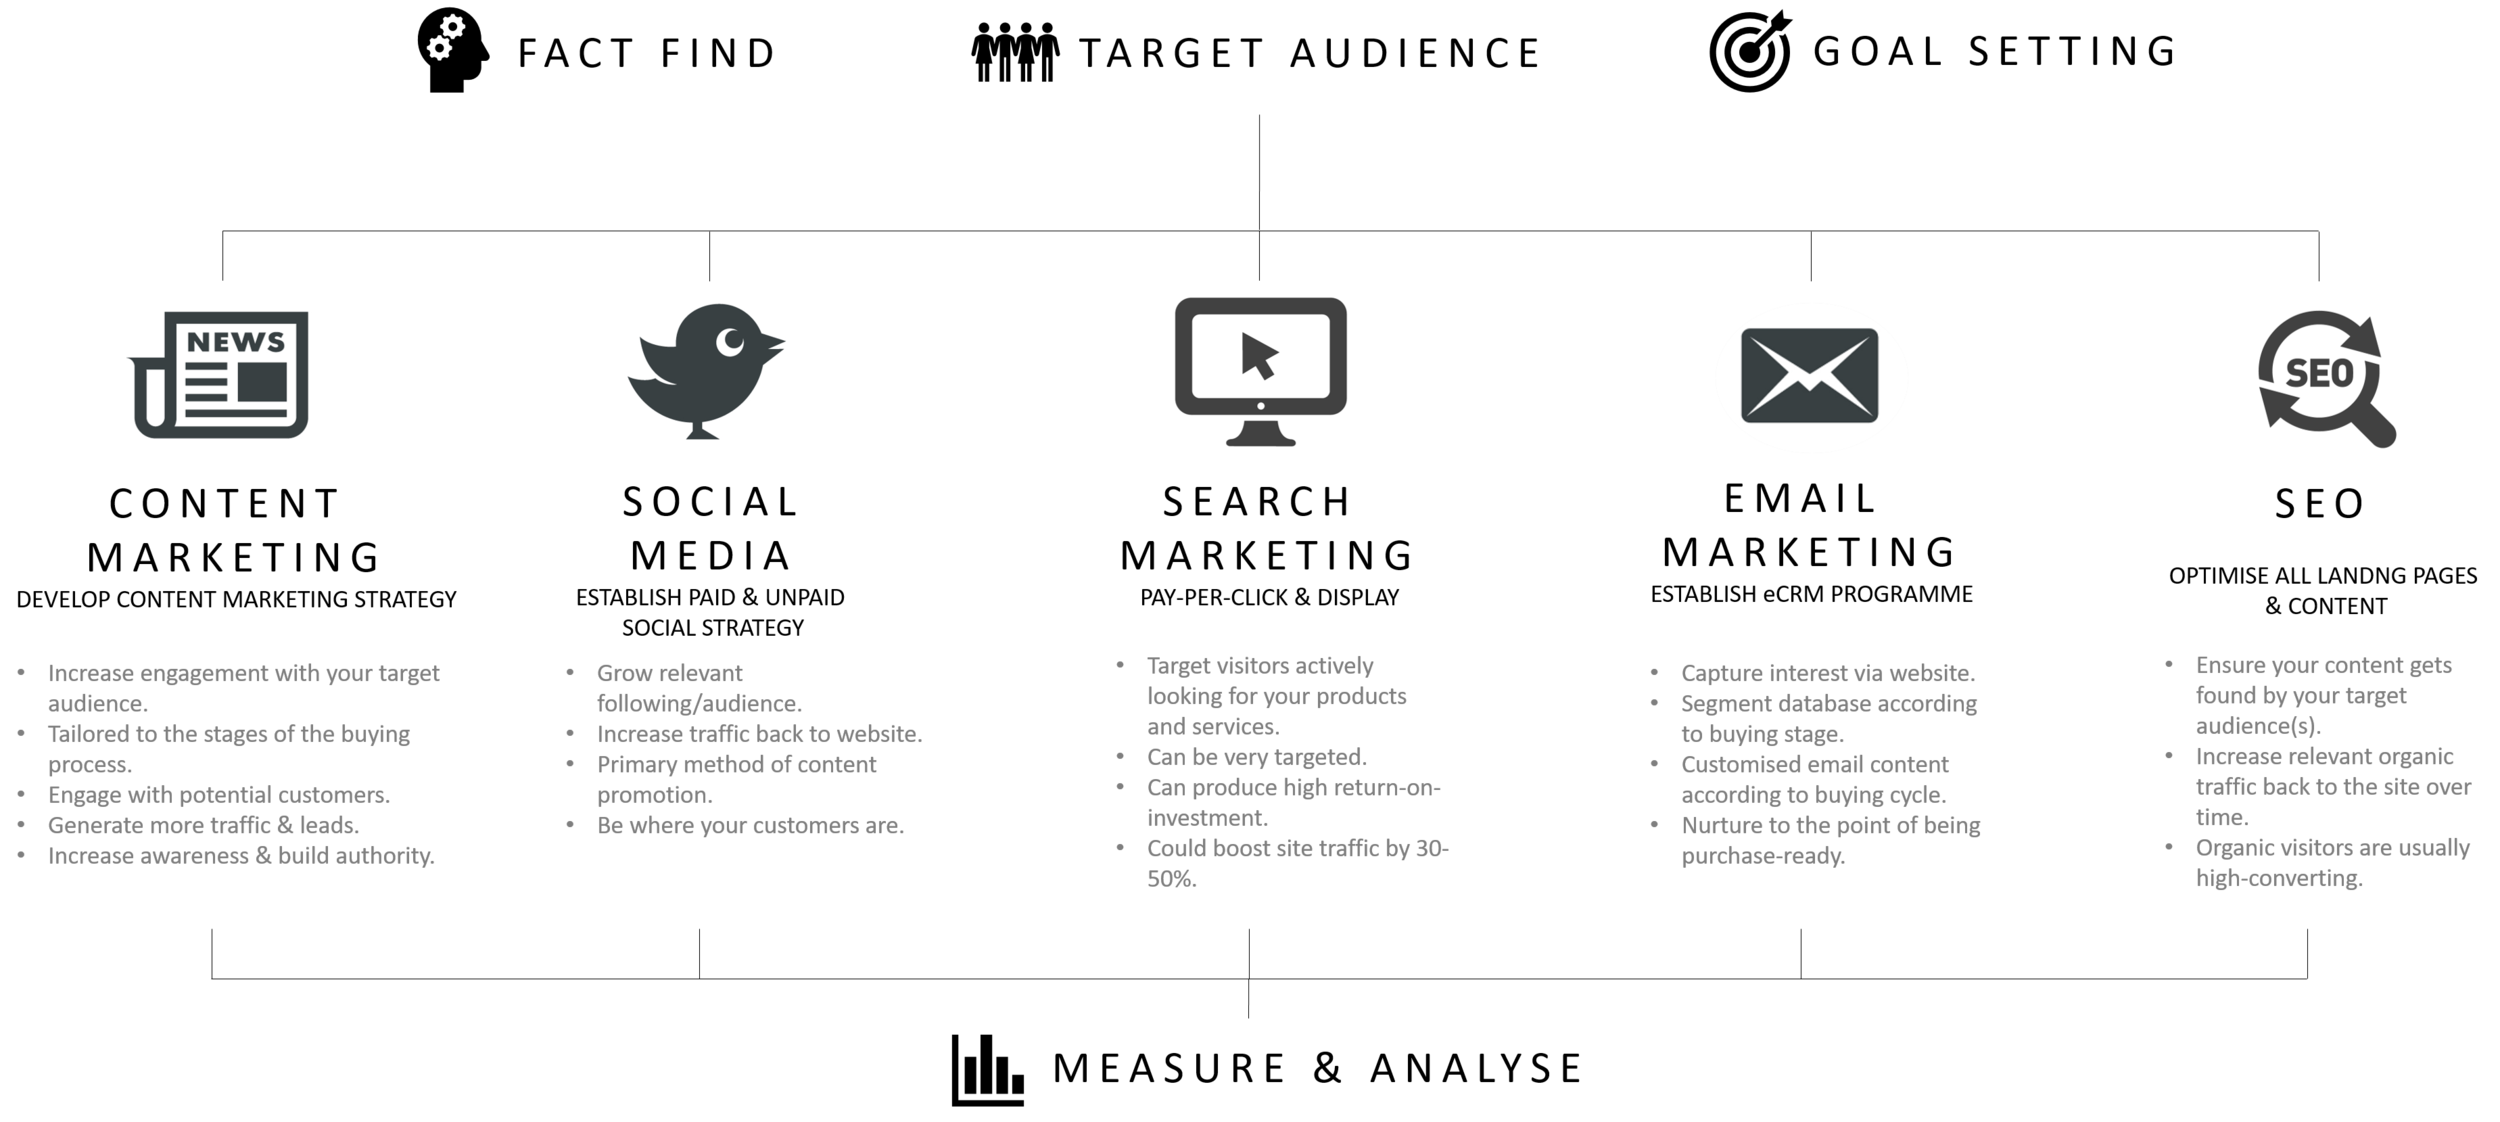 Digital-marketing-strategy.jpg